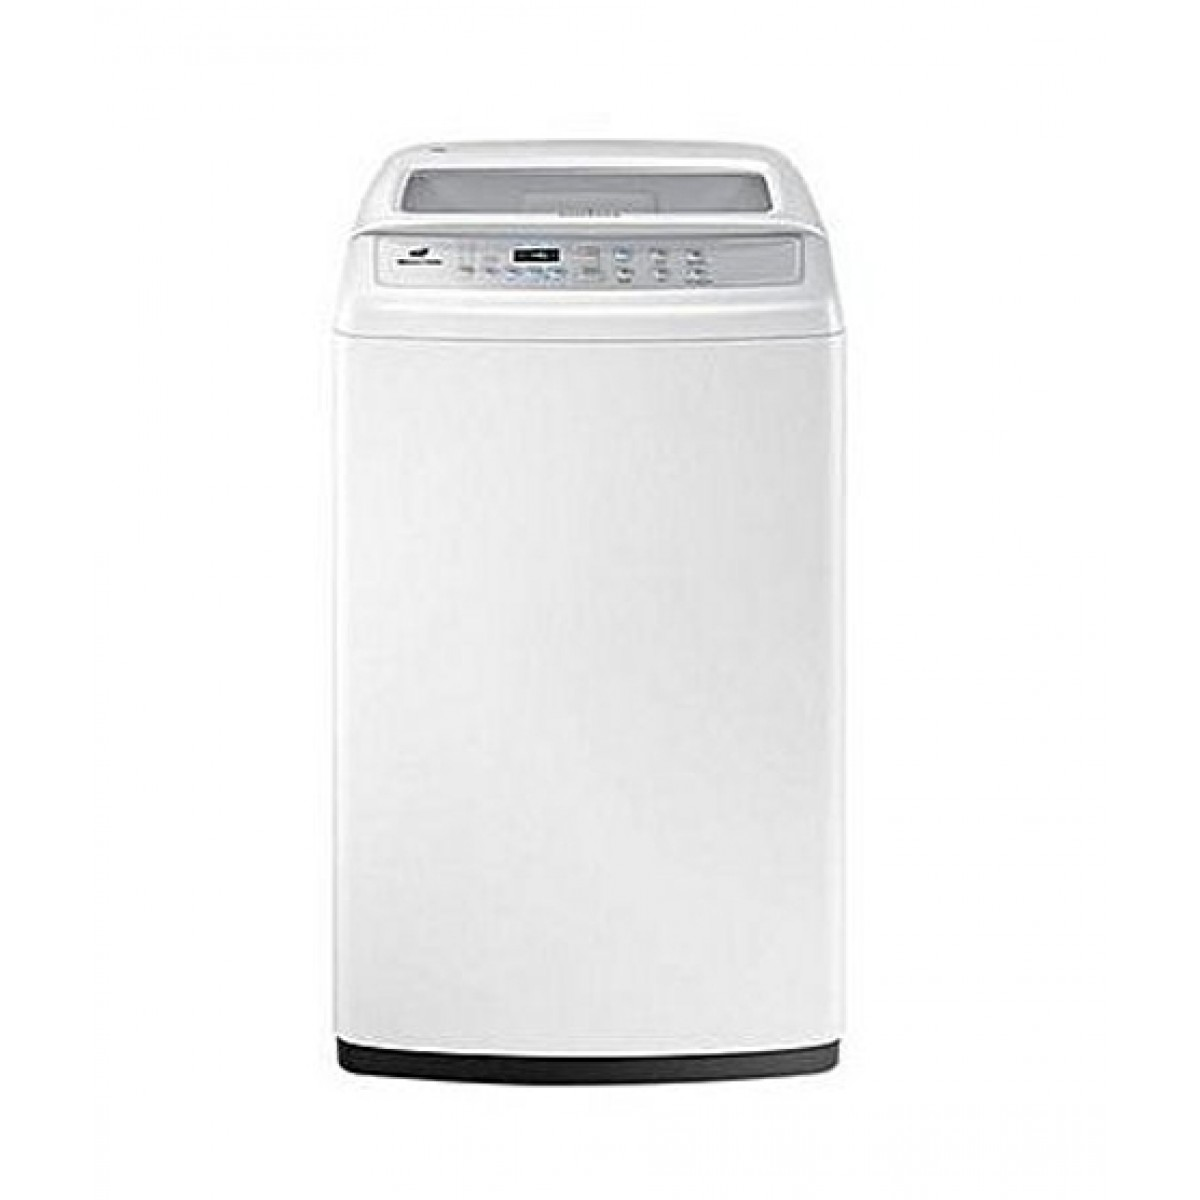 Samsung Washing Machine (WA70H4200SW) Price in Pakistan ...